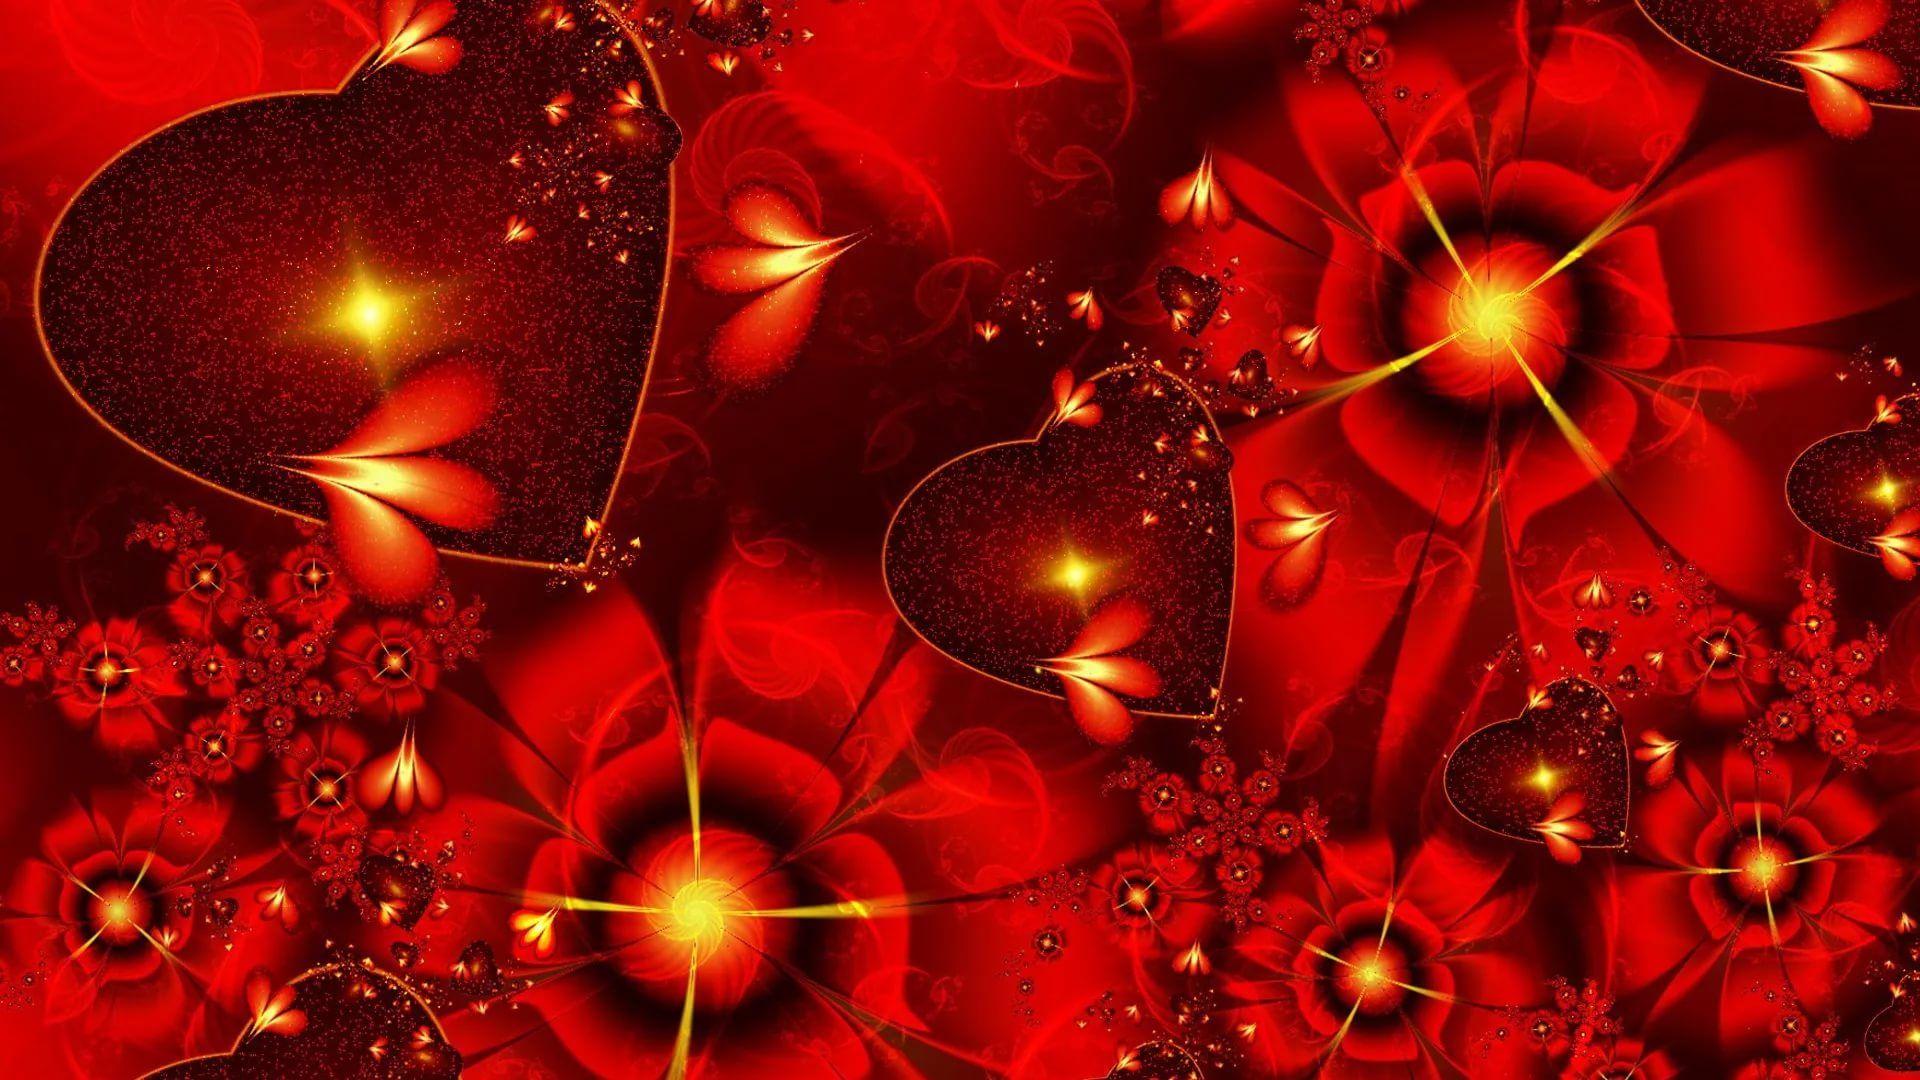 Valentine Screensaver wallpaper image